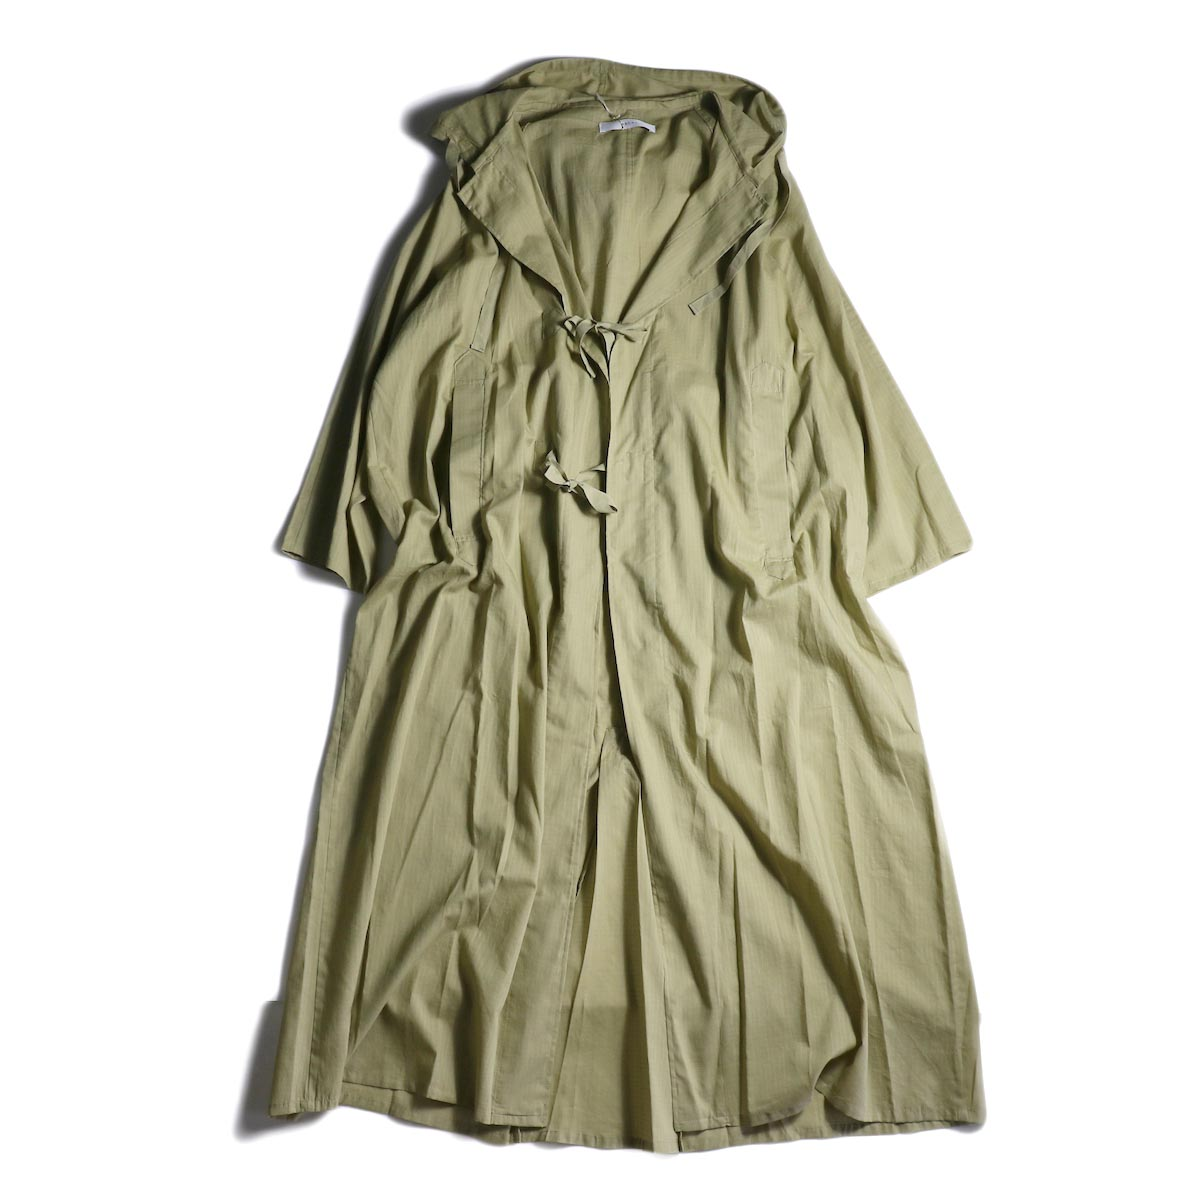 archi / RUMEX HOOD LONG SHIRT (Khaki)